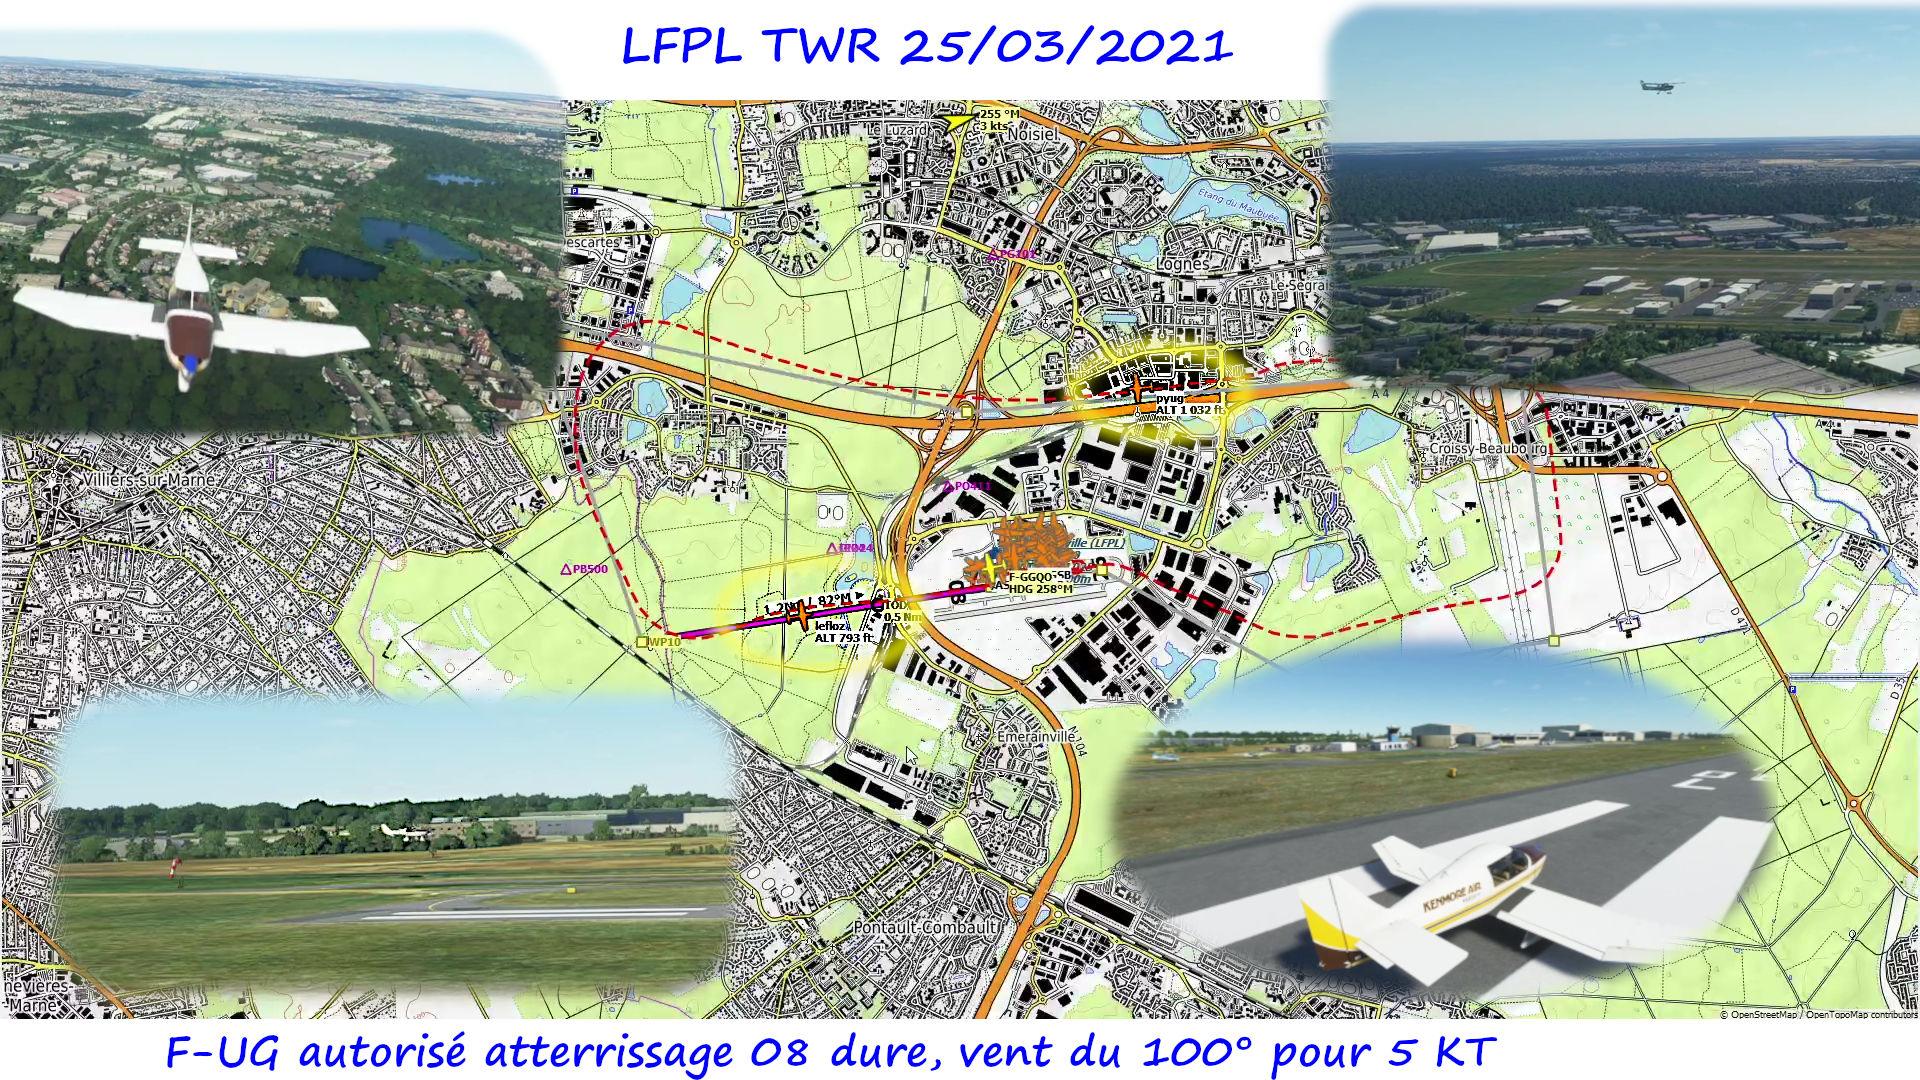 2021-03-25_LFPL_TWR-banniere